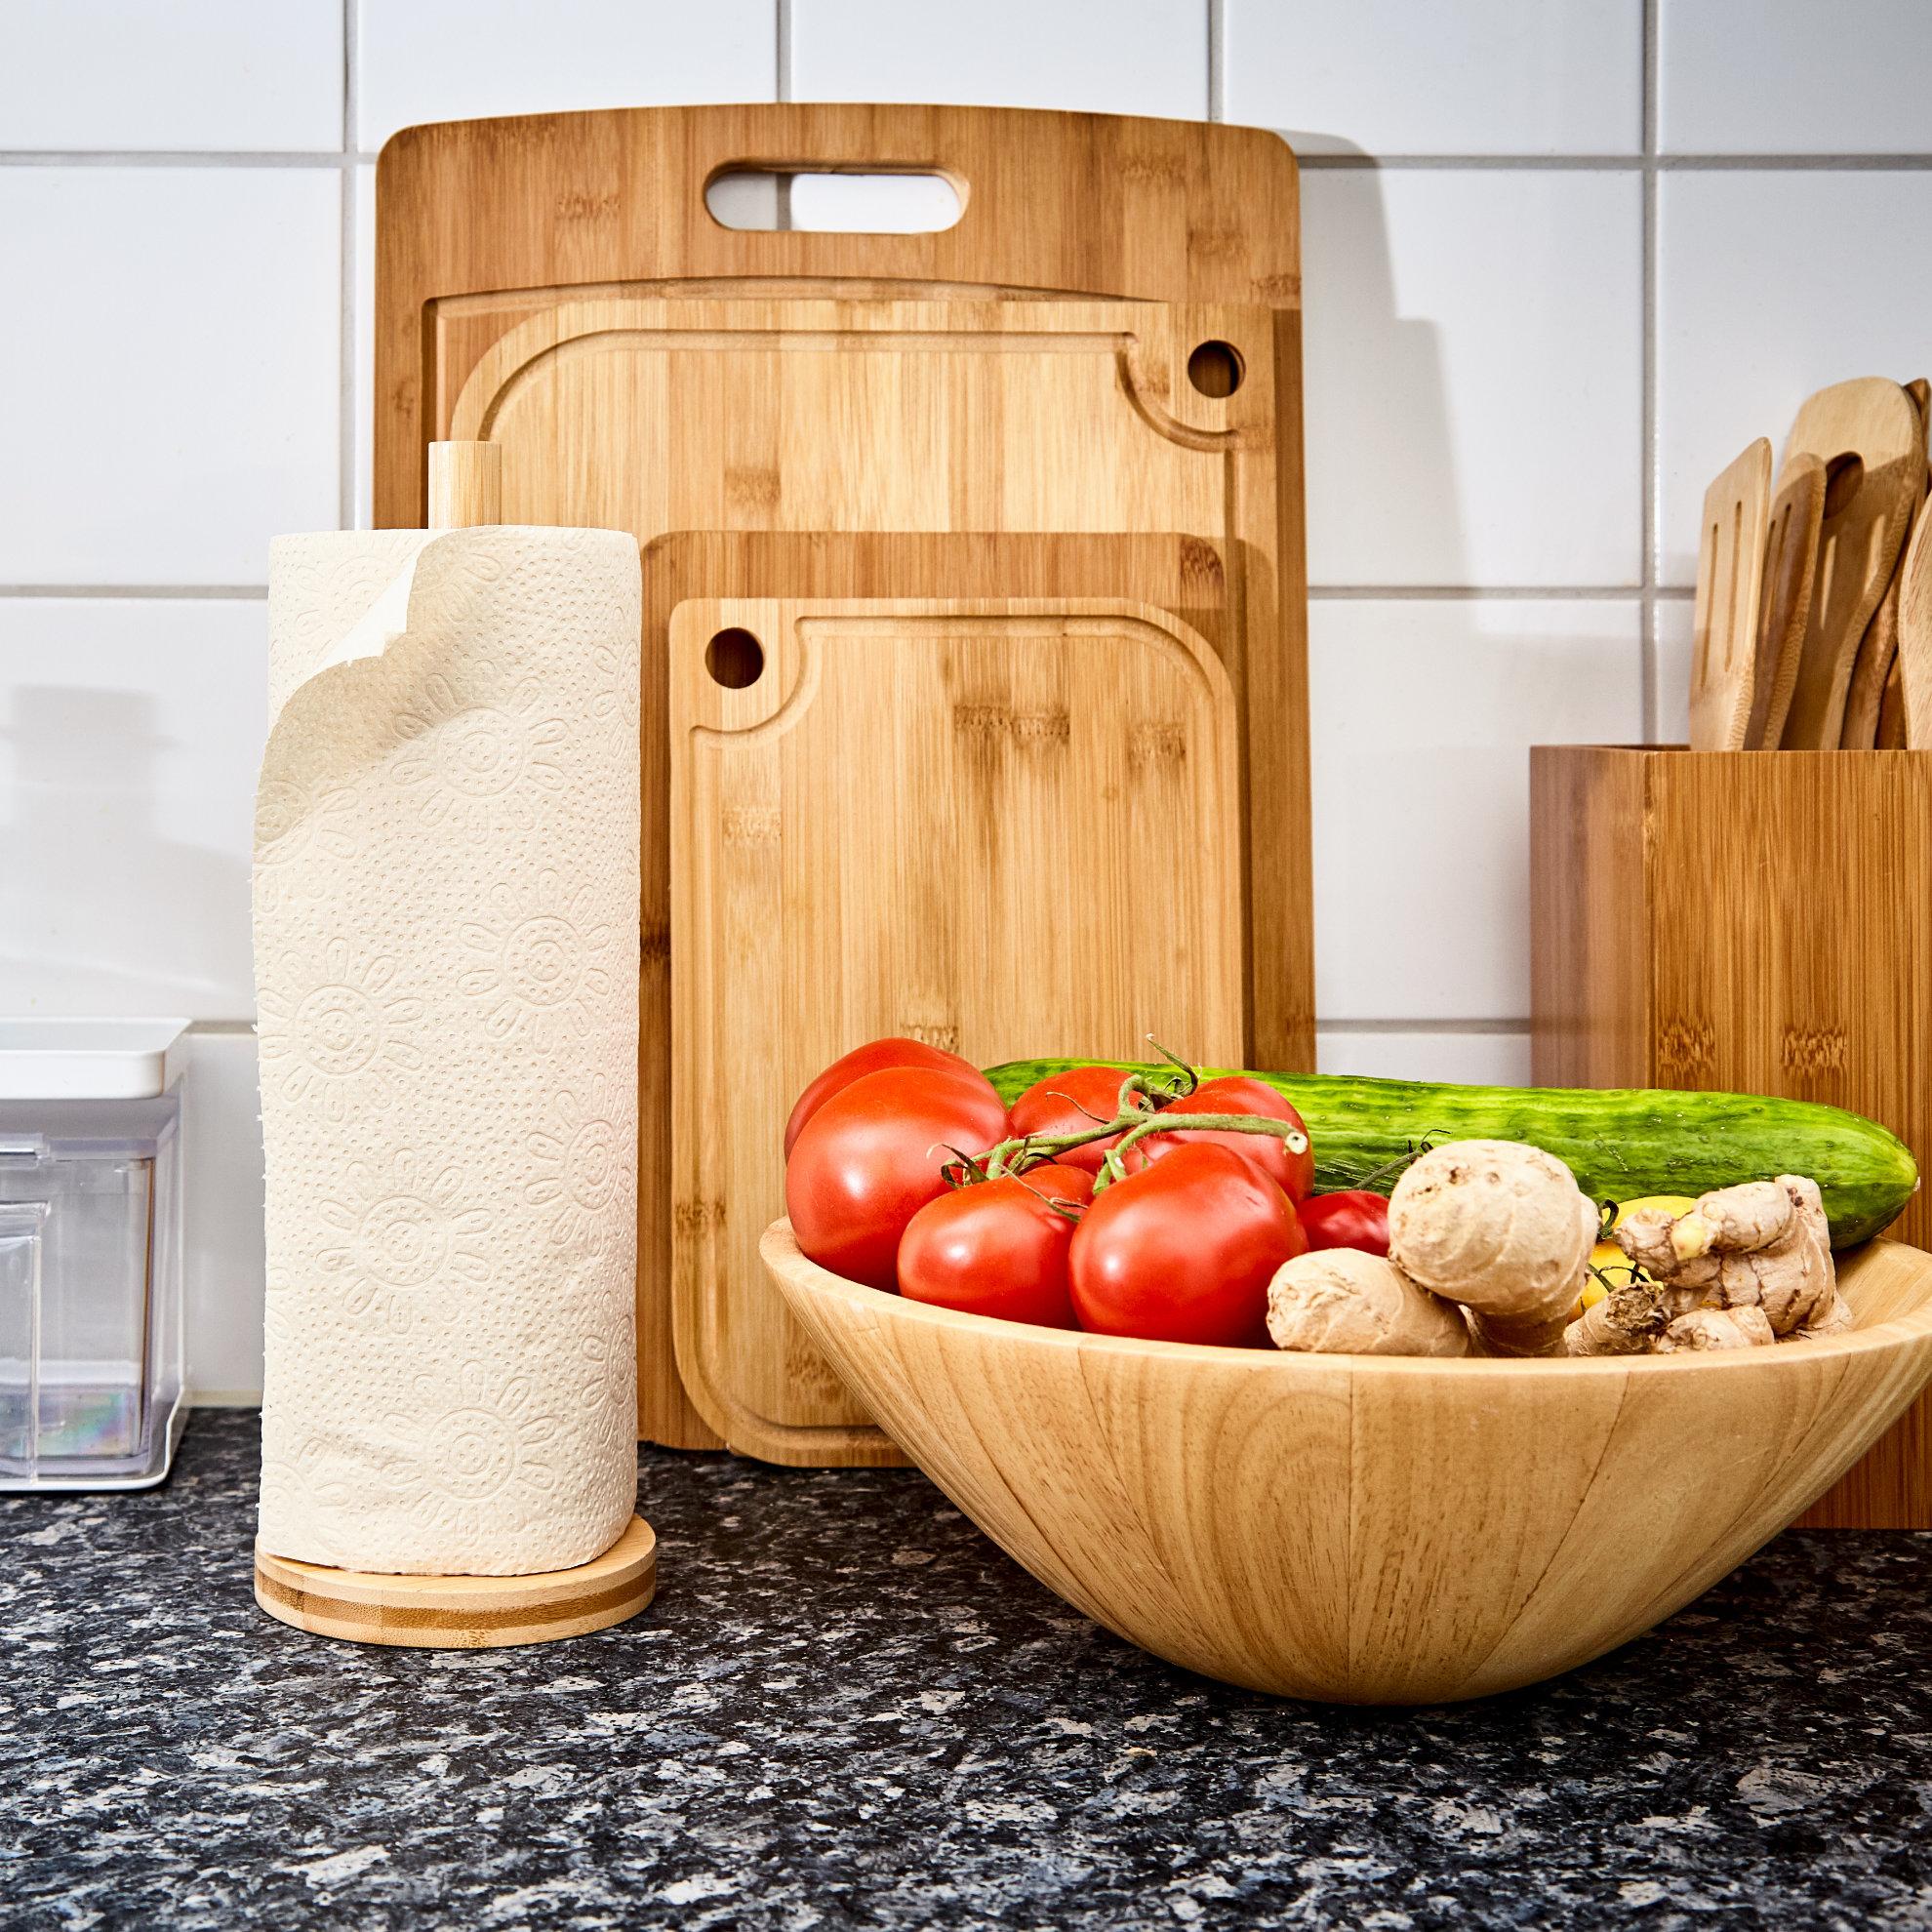 Bambuswald Küchenrolle 100% Bambus 3 Rollen